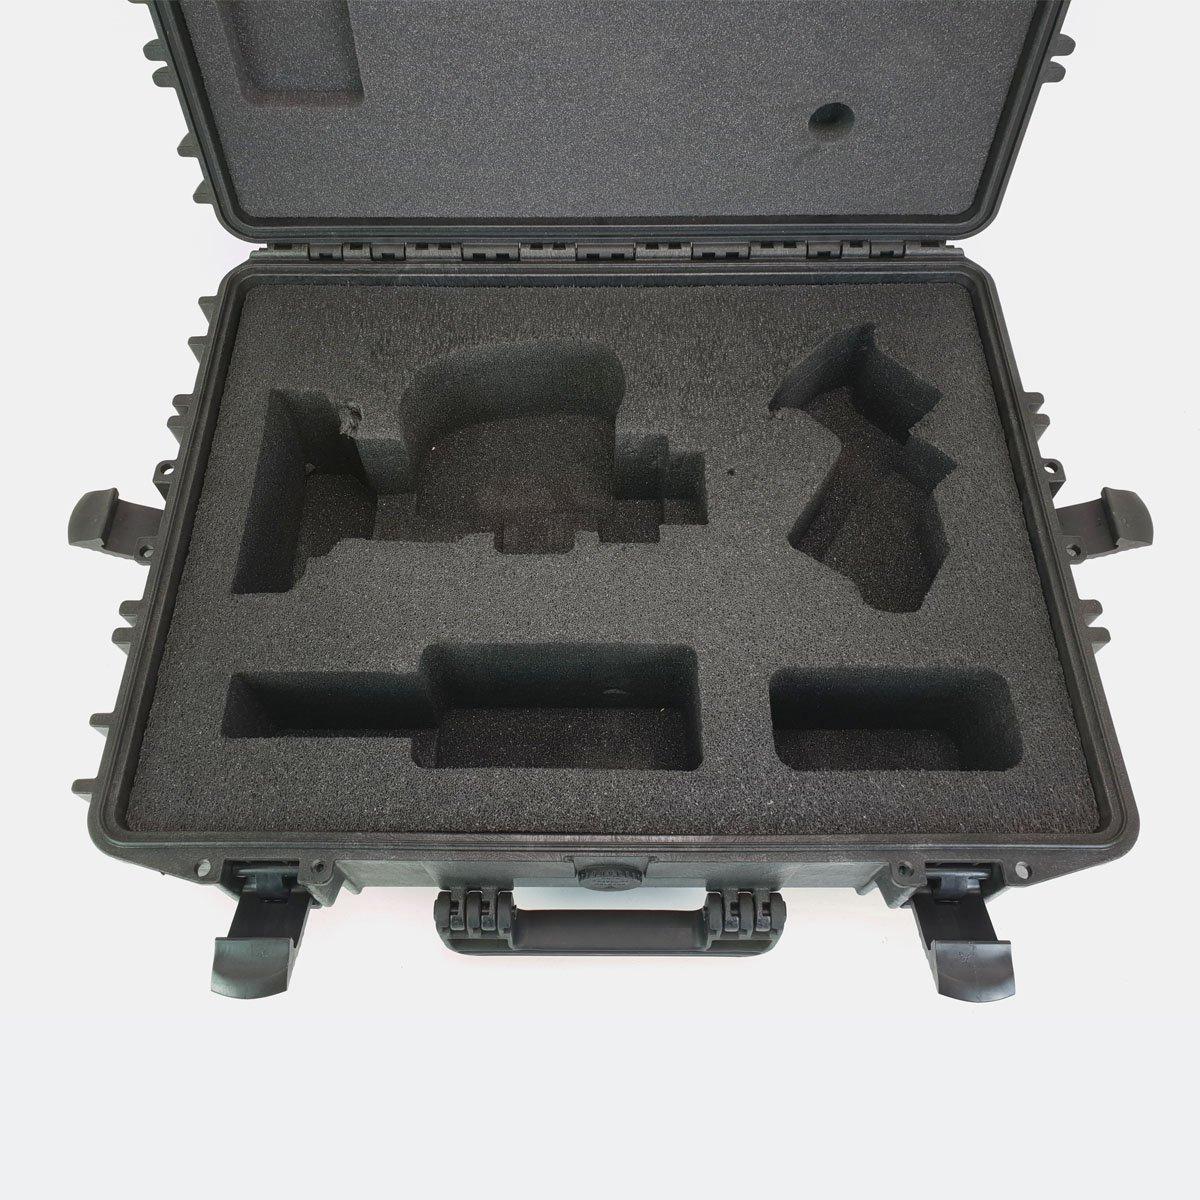 Ex-Demo Flight case for Canon CJ12 lens